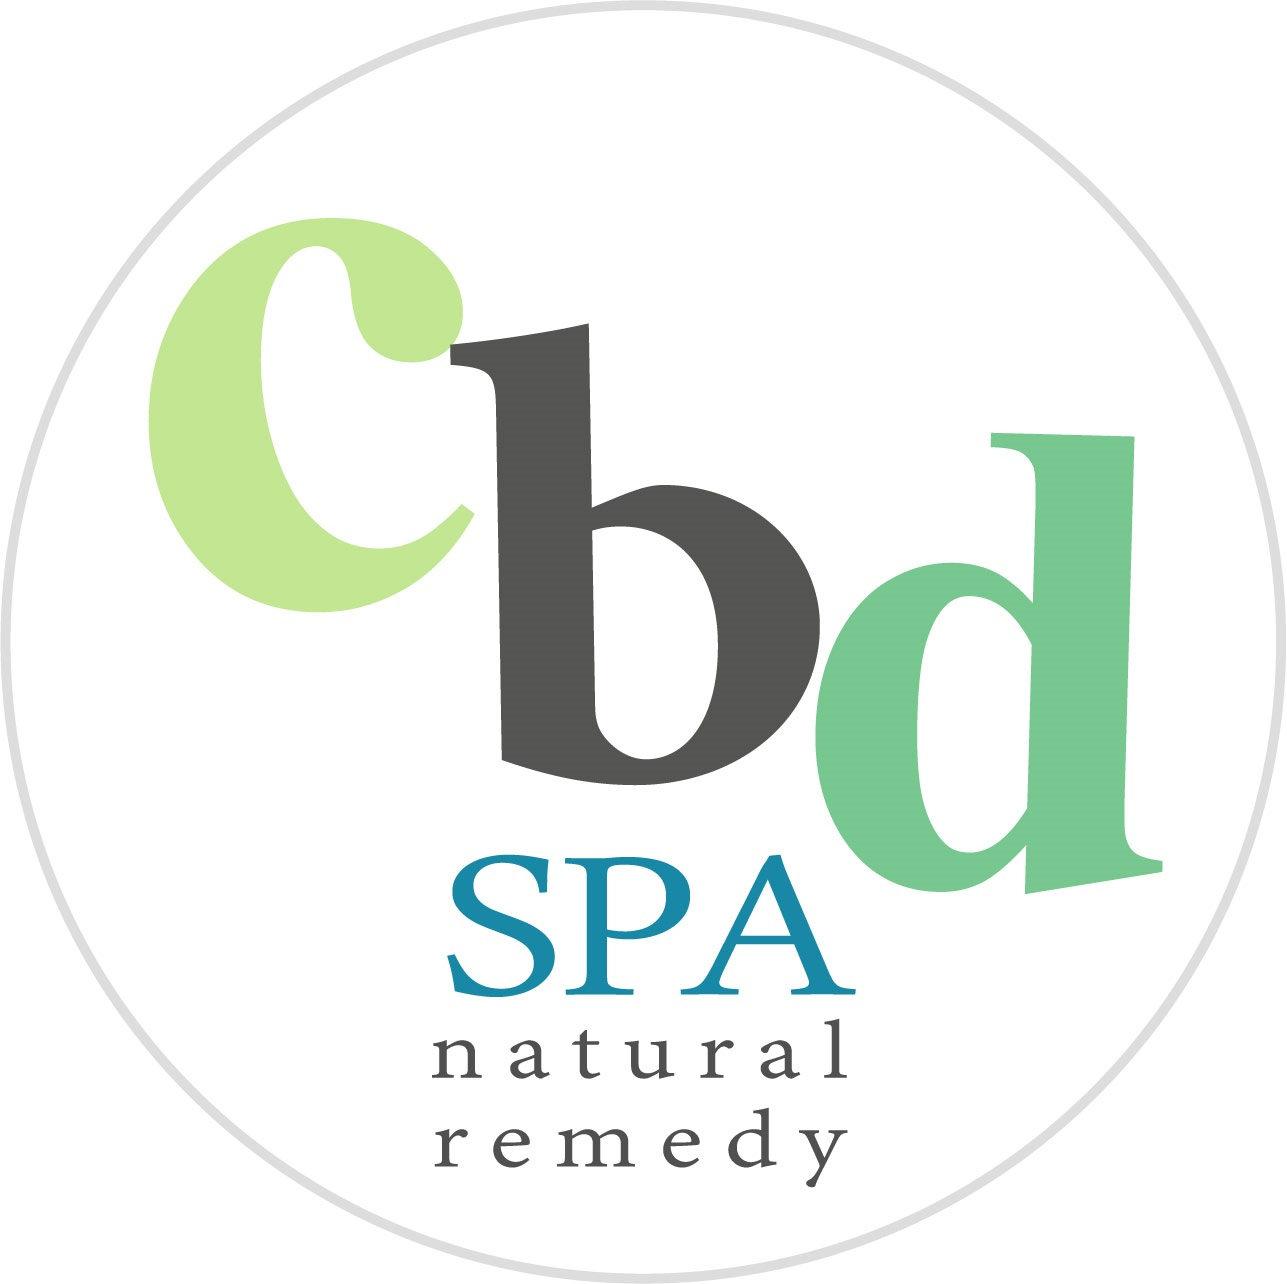 CBD SPA TM Certified Massage